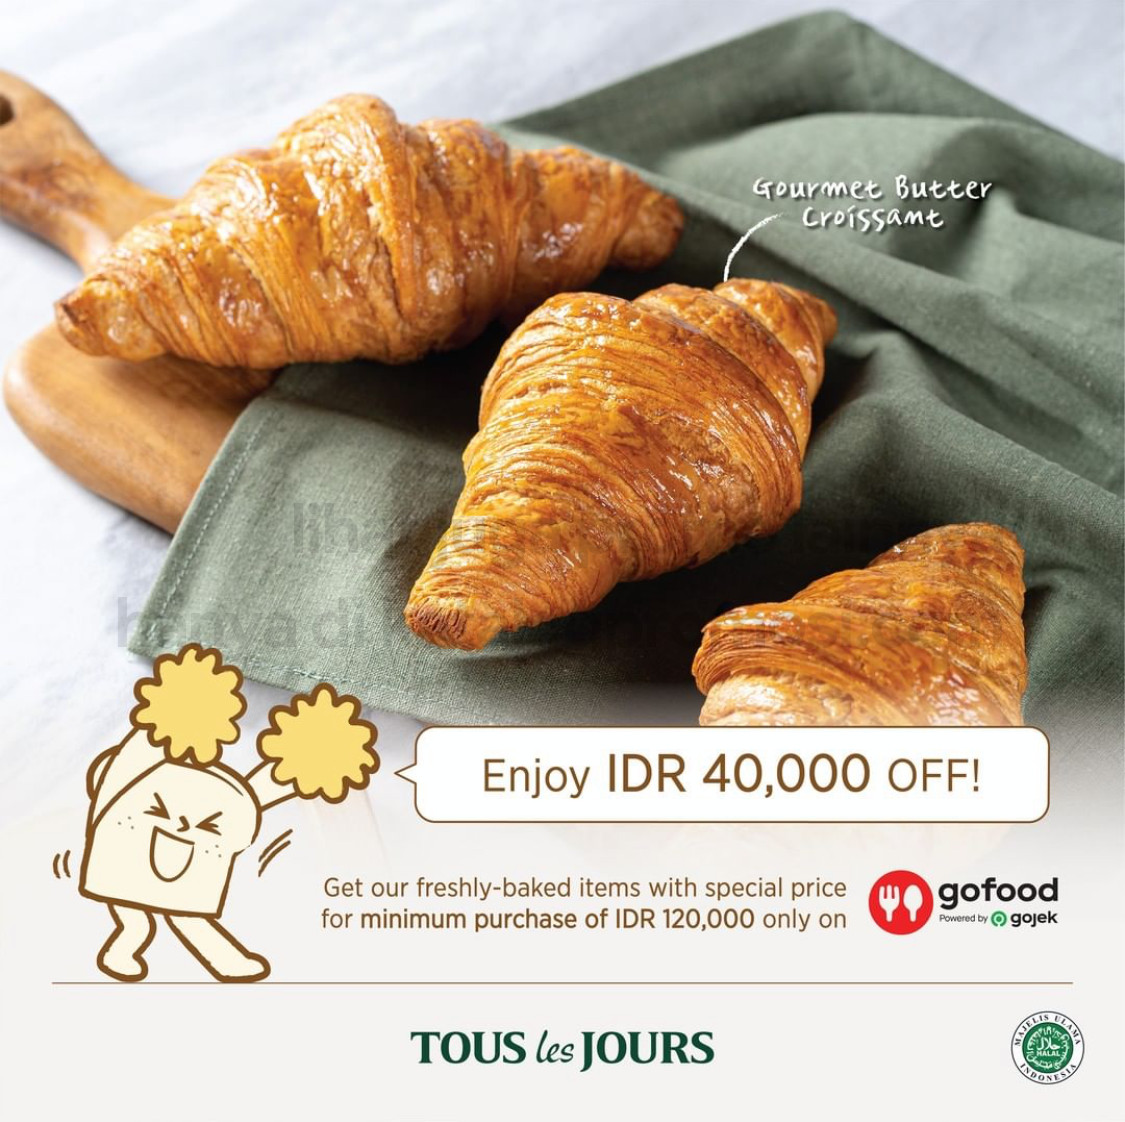 Promo TOUS LES JOURS DISKON hingga Rp. 40.000 khusus pemesanan via GOFOOD